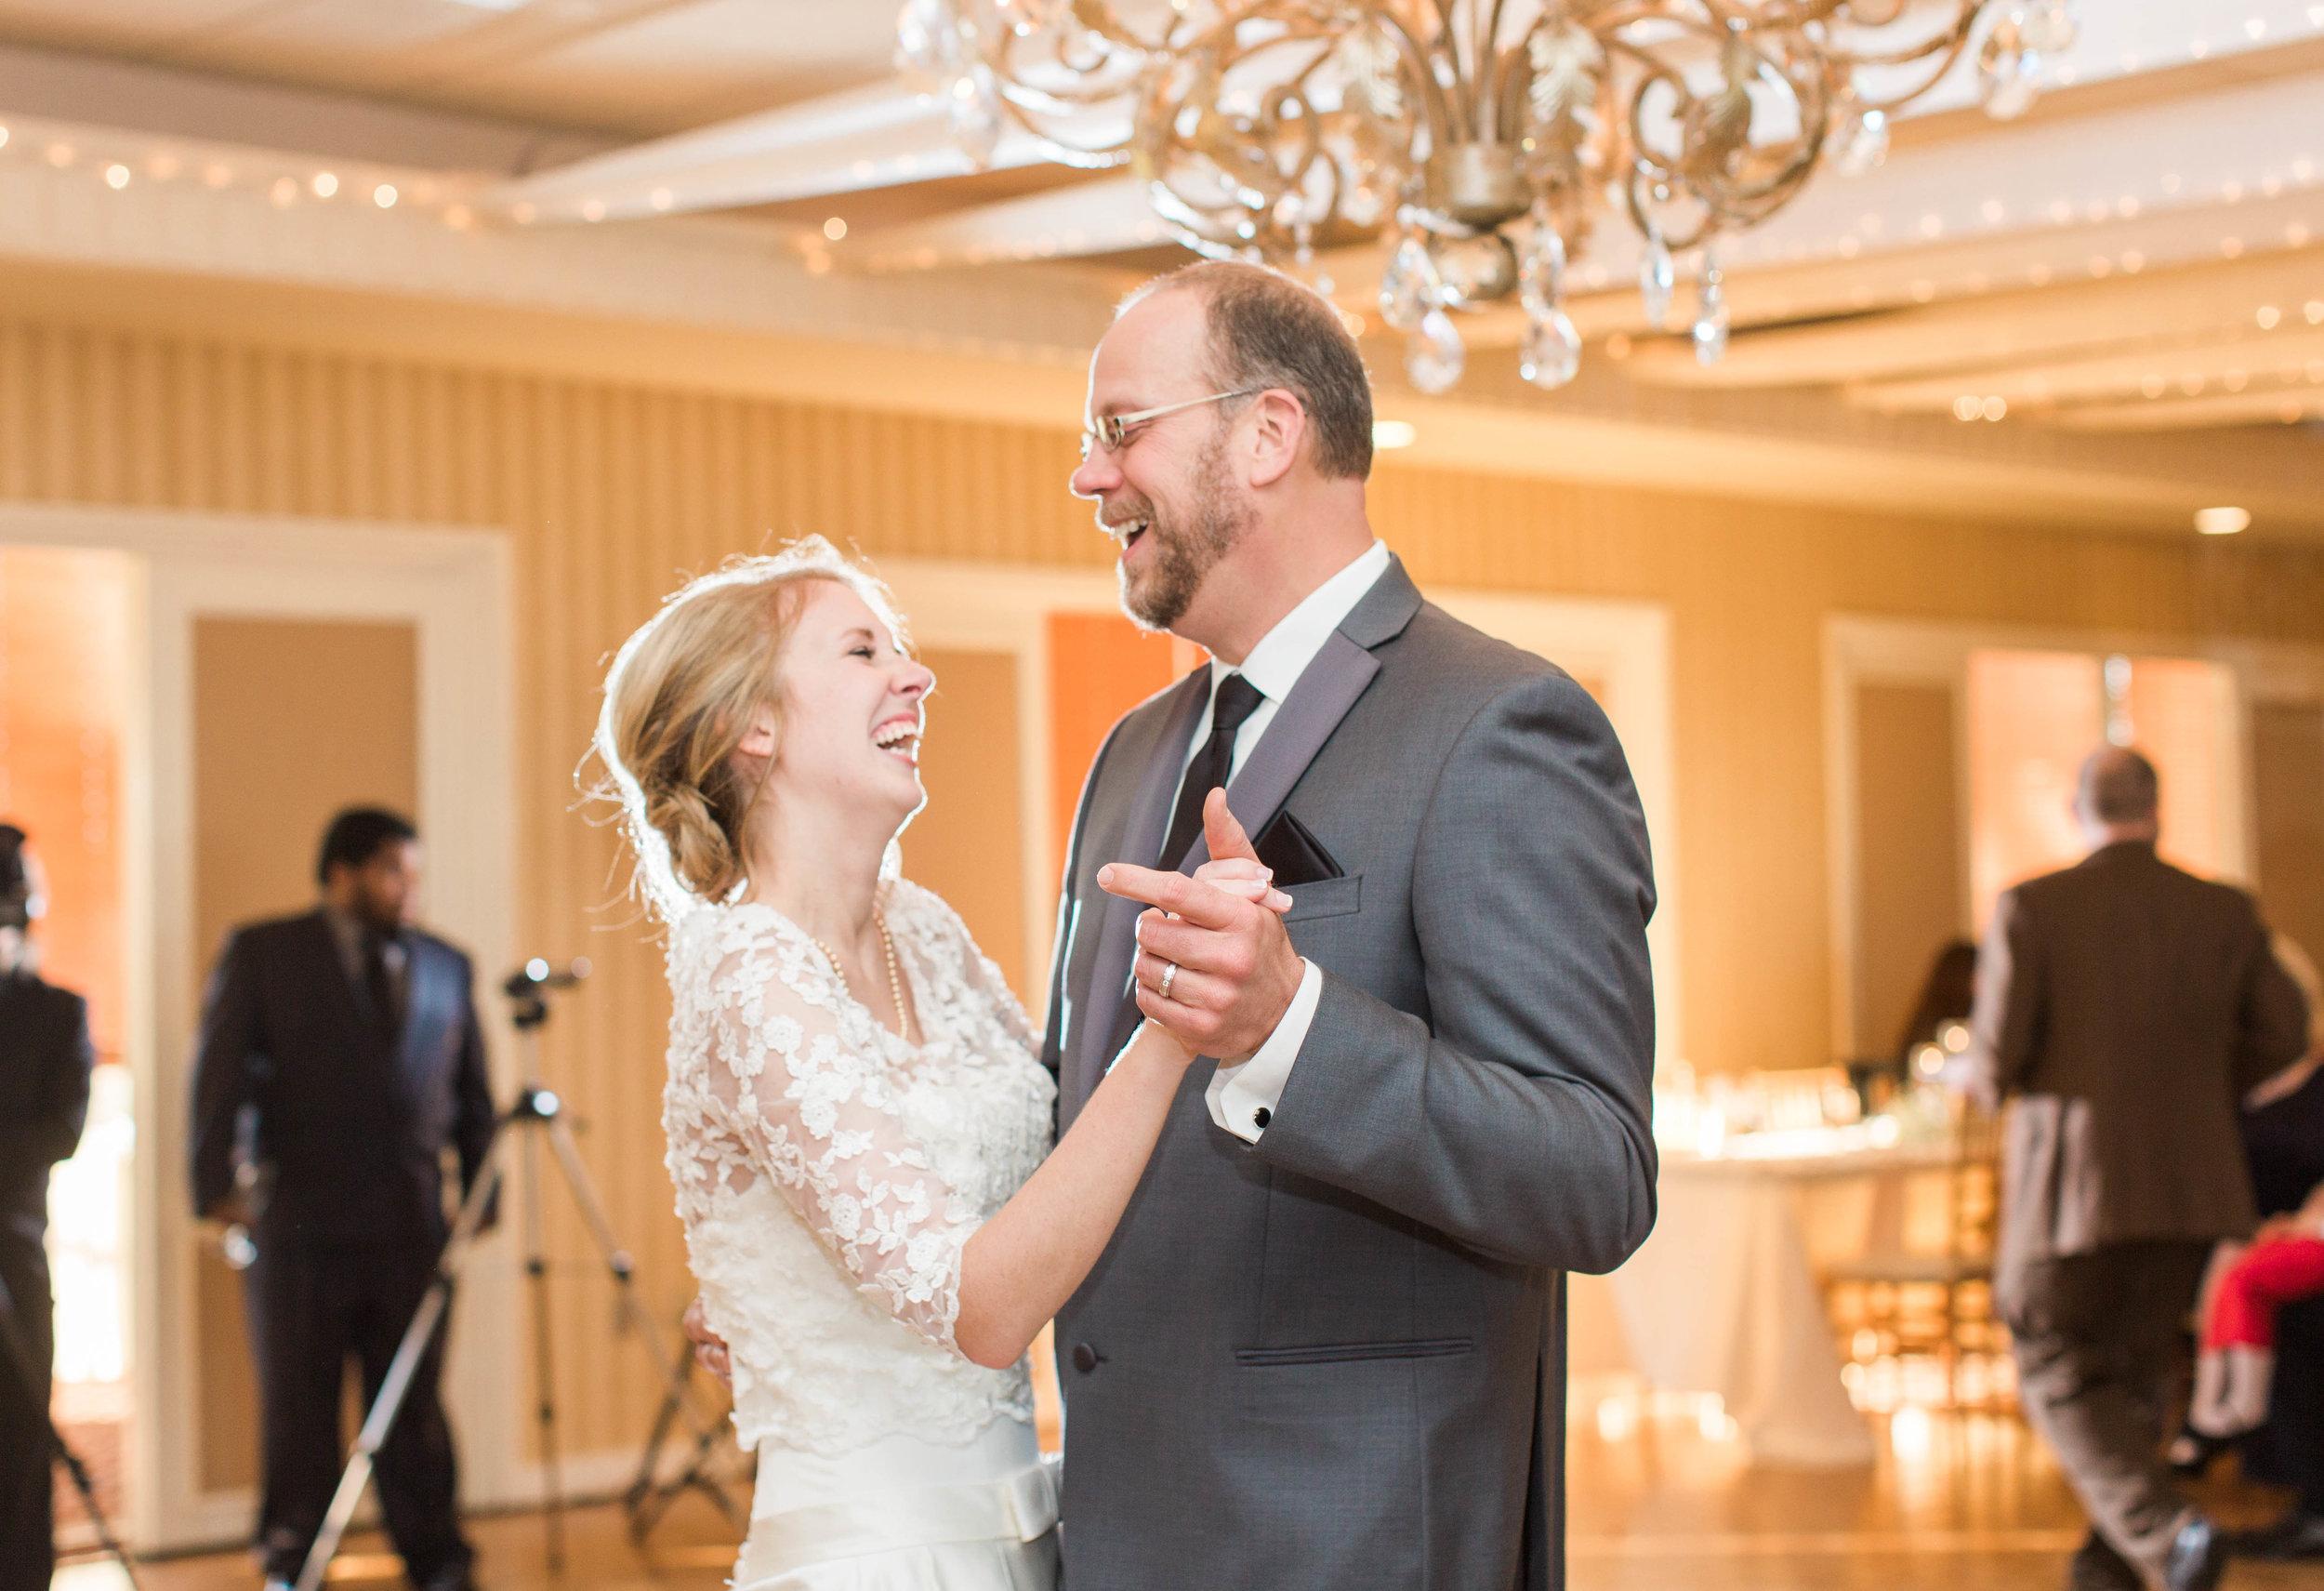 Beaumont Texas Country Club wedding-6264.jpg